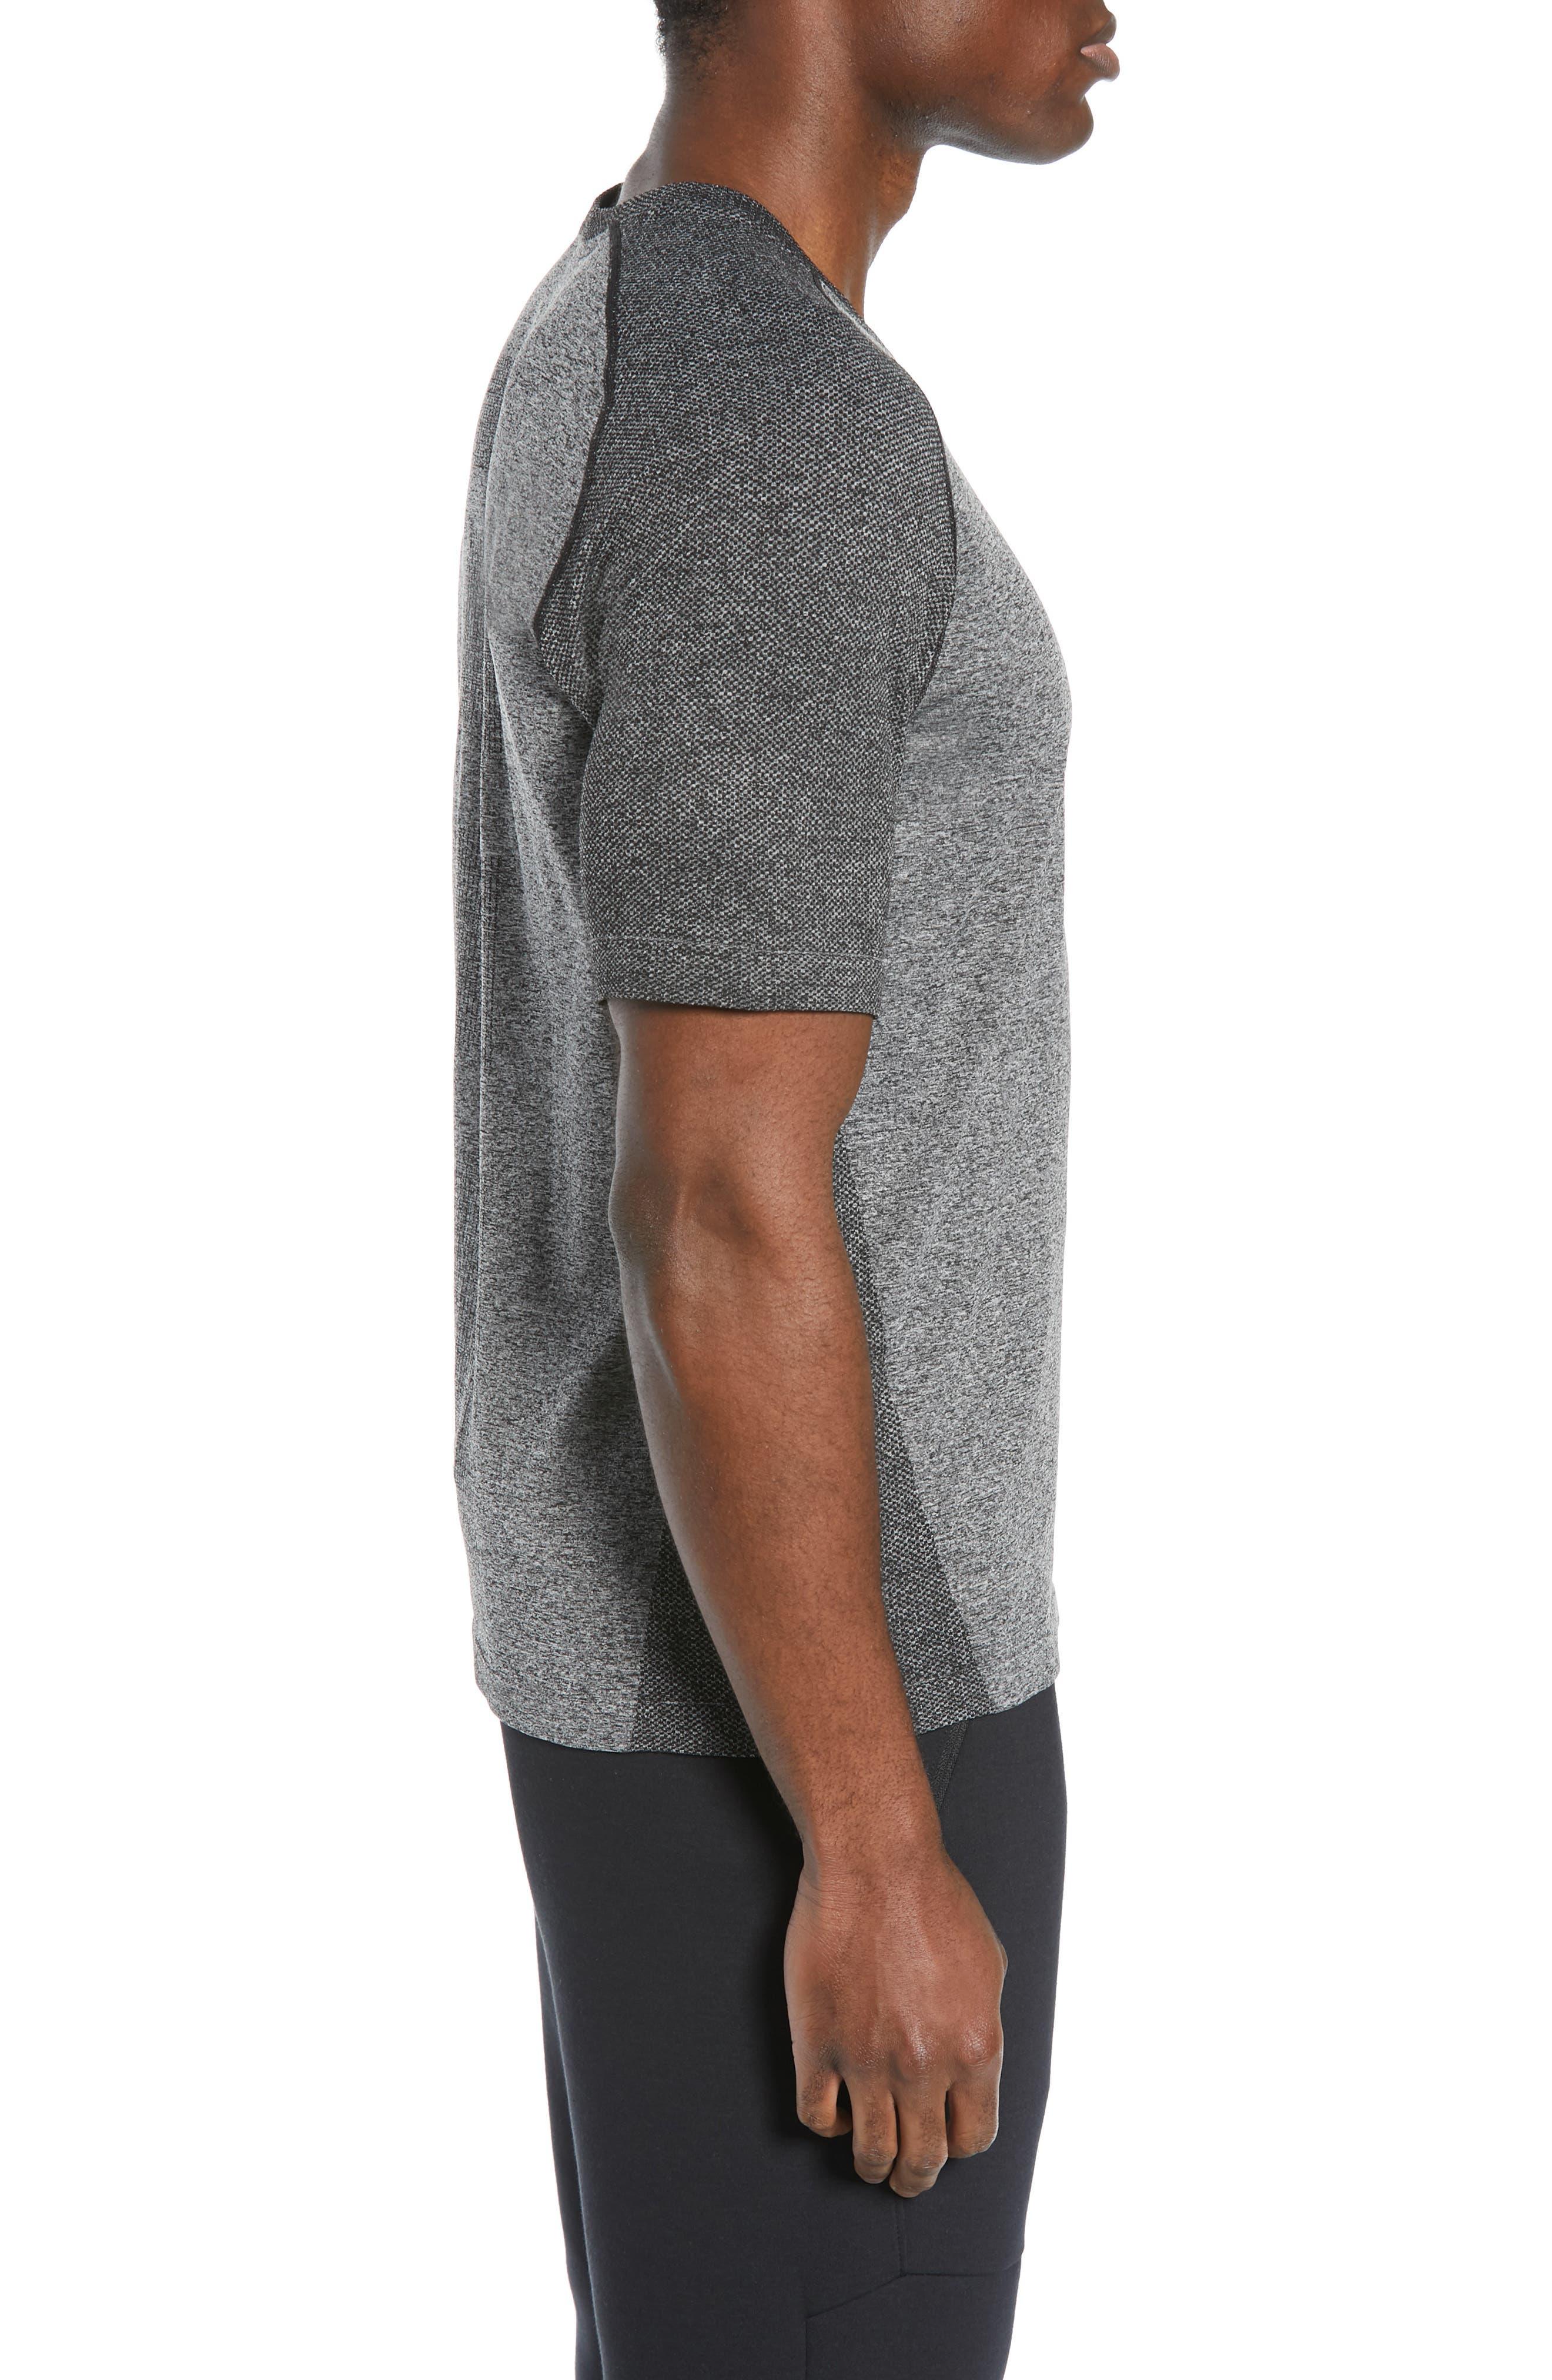 ZELLA, Seamless Raglan T-Shirt, Alternate thumbnail 4, color, BLACK OXIDE MELANGE